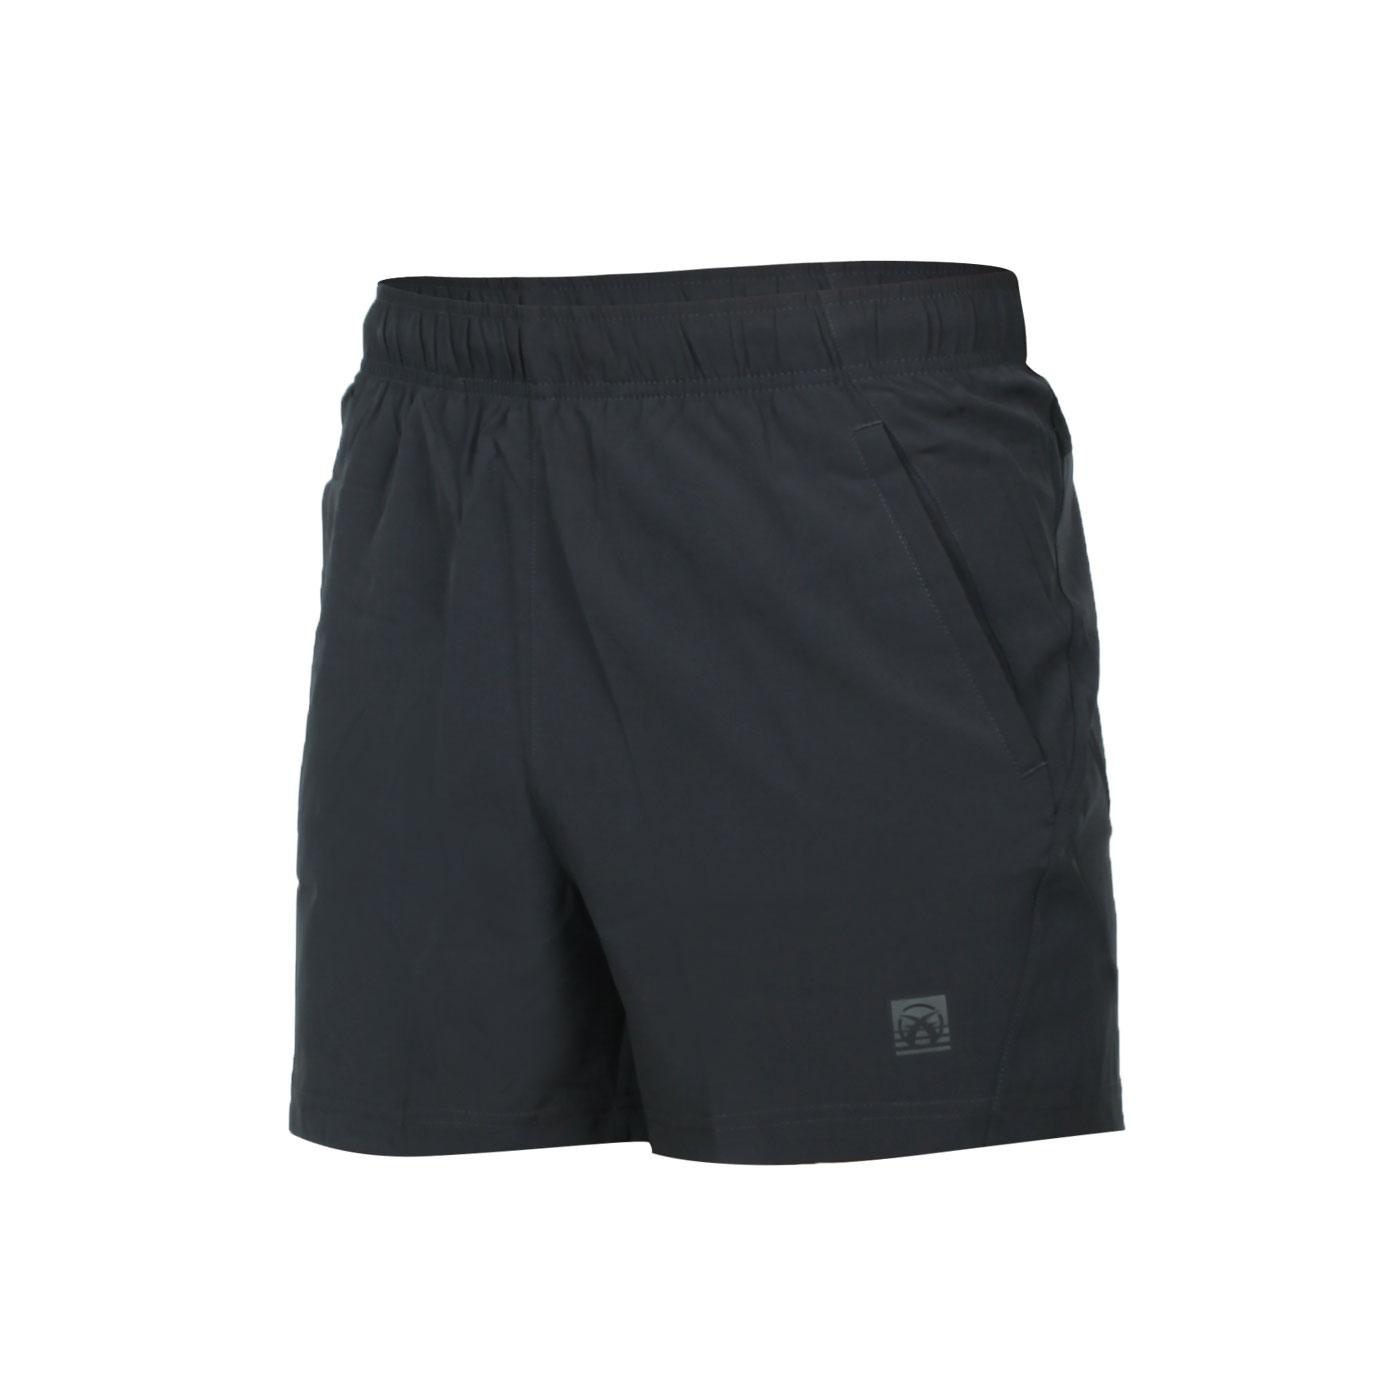 FIRESTAR 男款彈性平織慢跑短褲 C1710-15 - 深灰黑銀